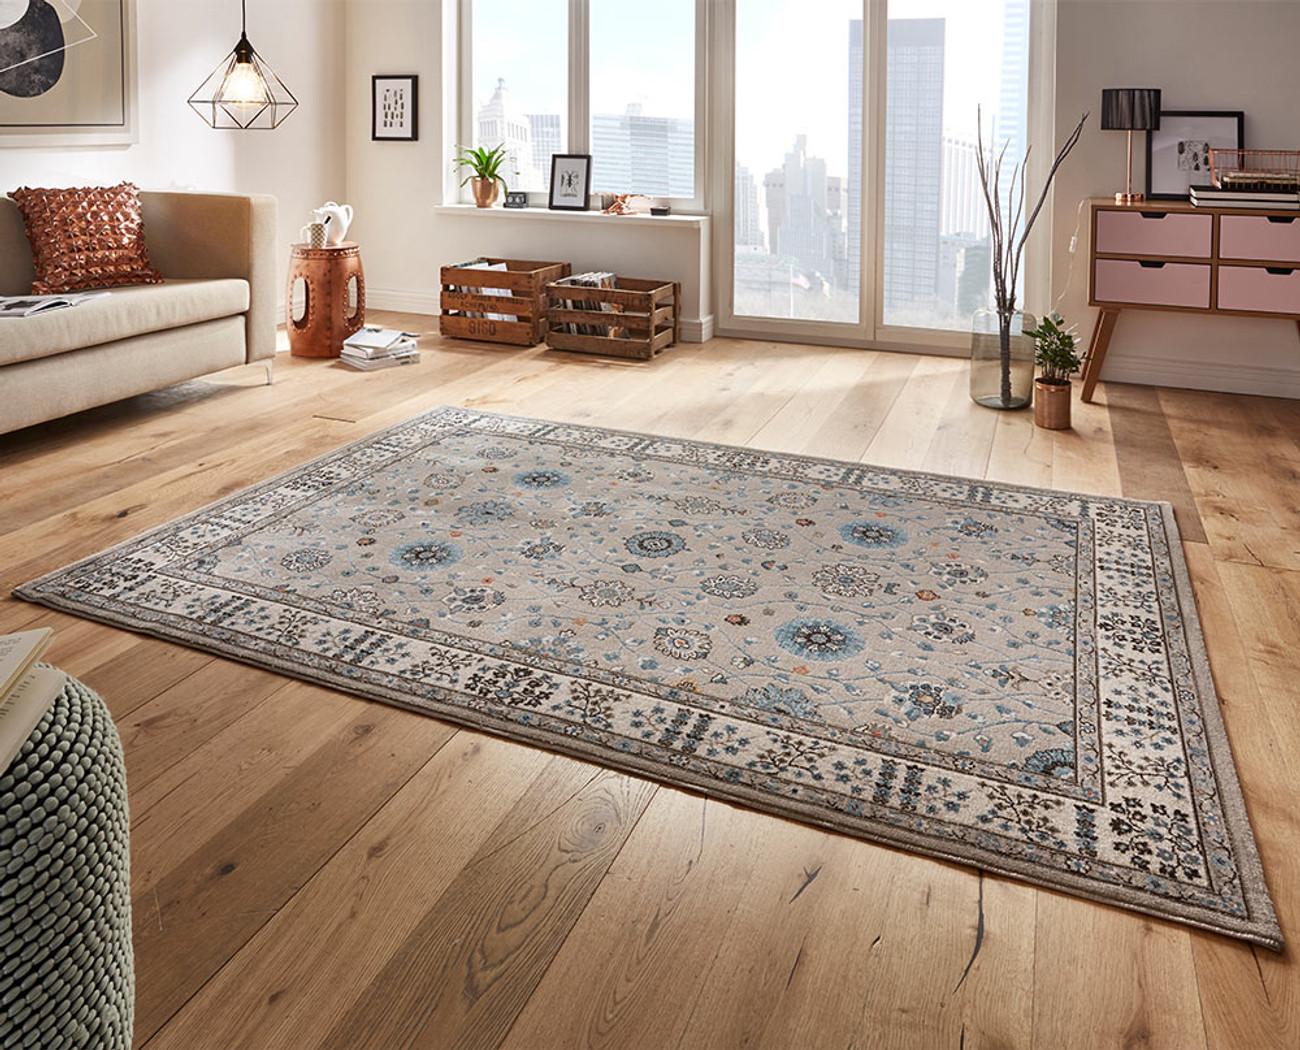 design velours teppich couture grau beige blau teppiche. Black Bedroom Furniture Sets. Home Design Ideas